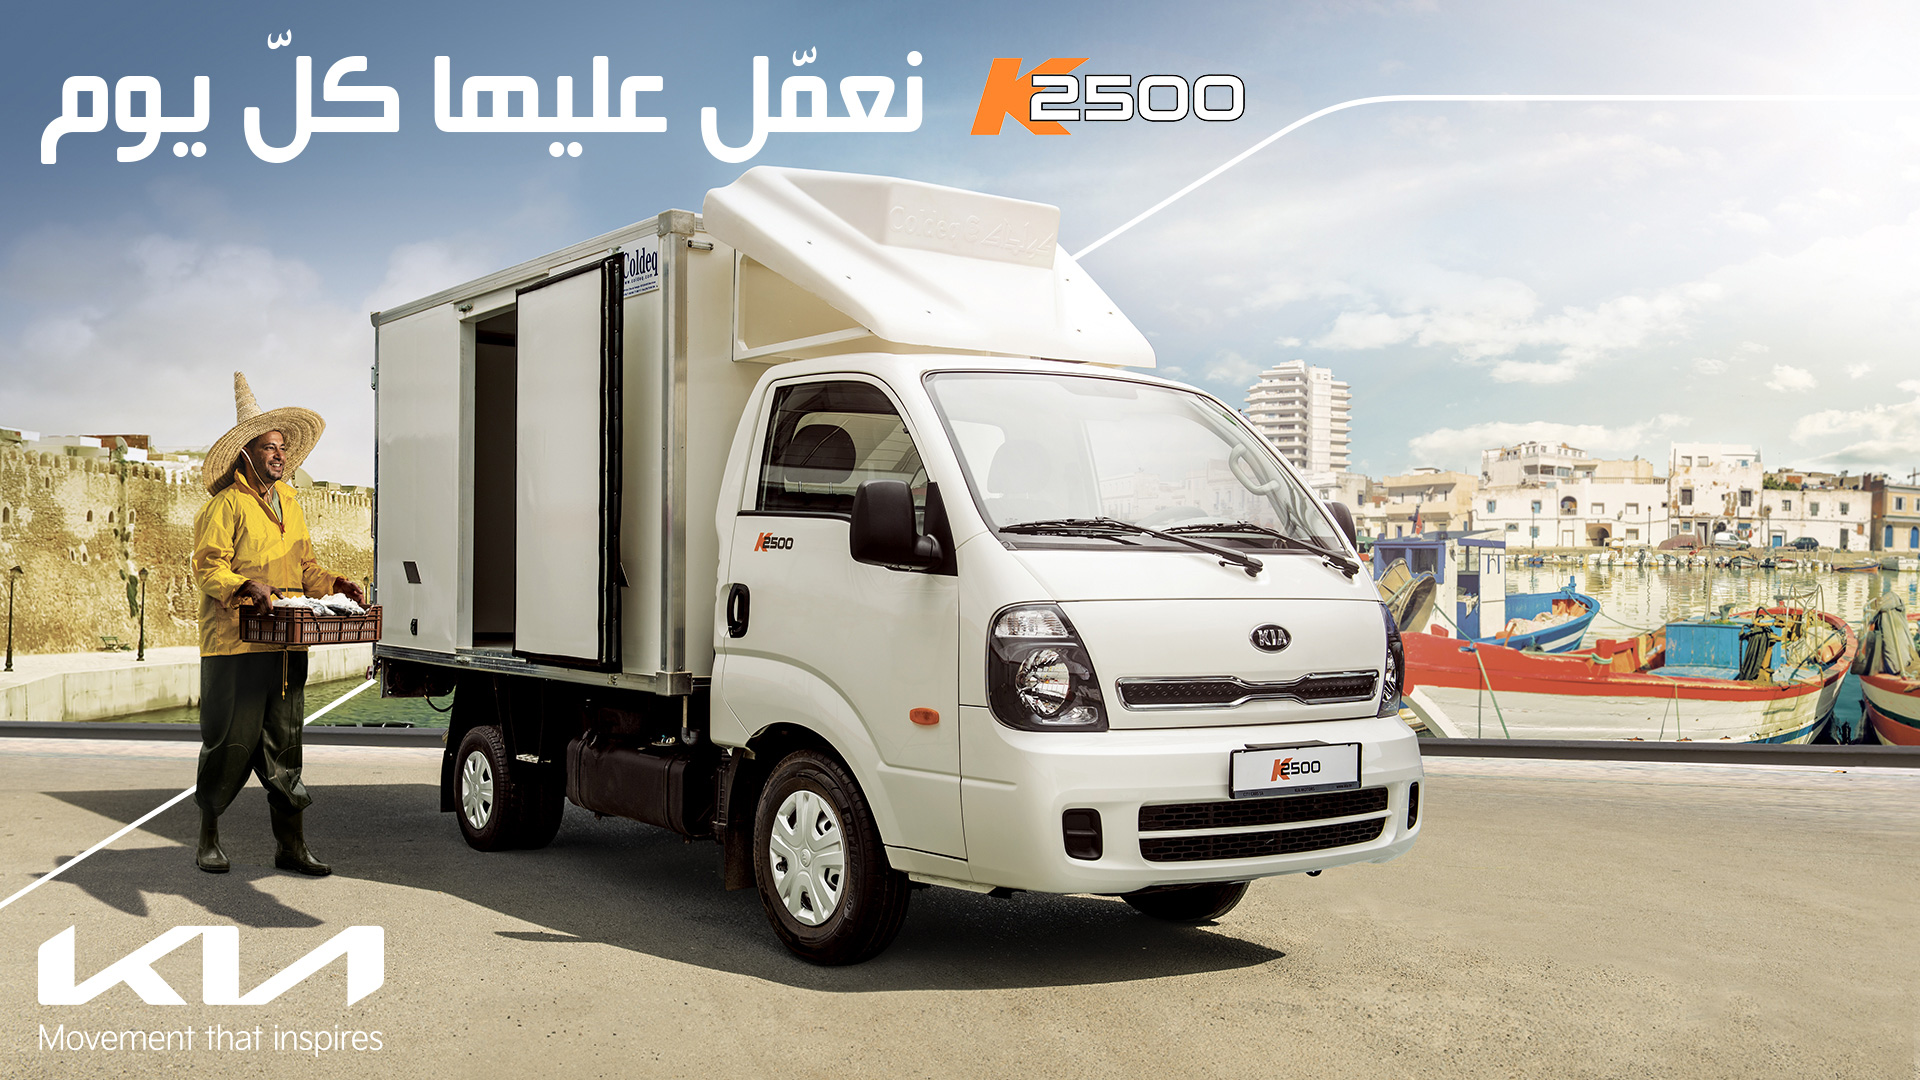 KIA k2500, lenouveau véhicule utilitaire Kia